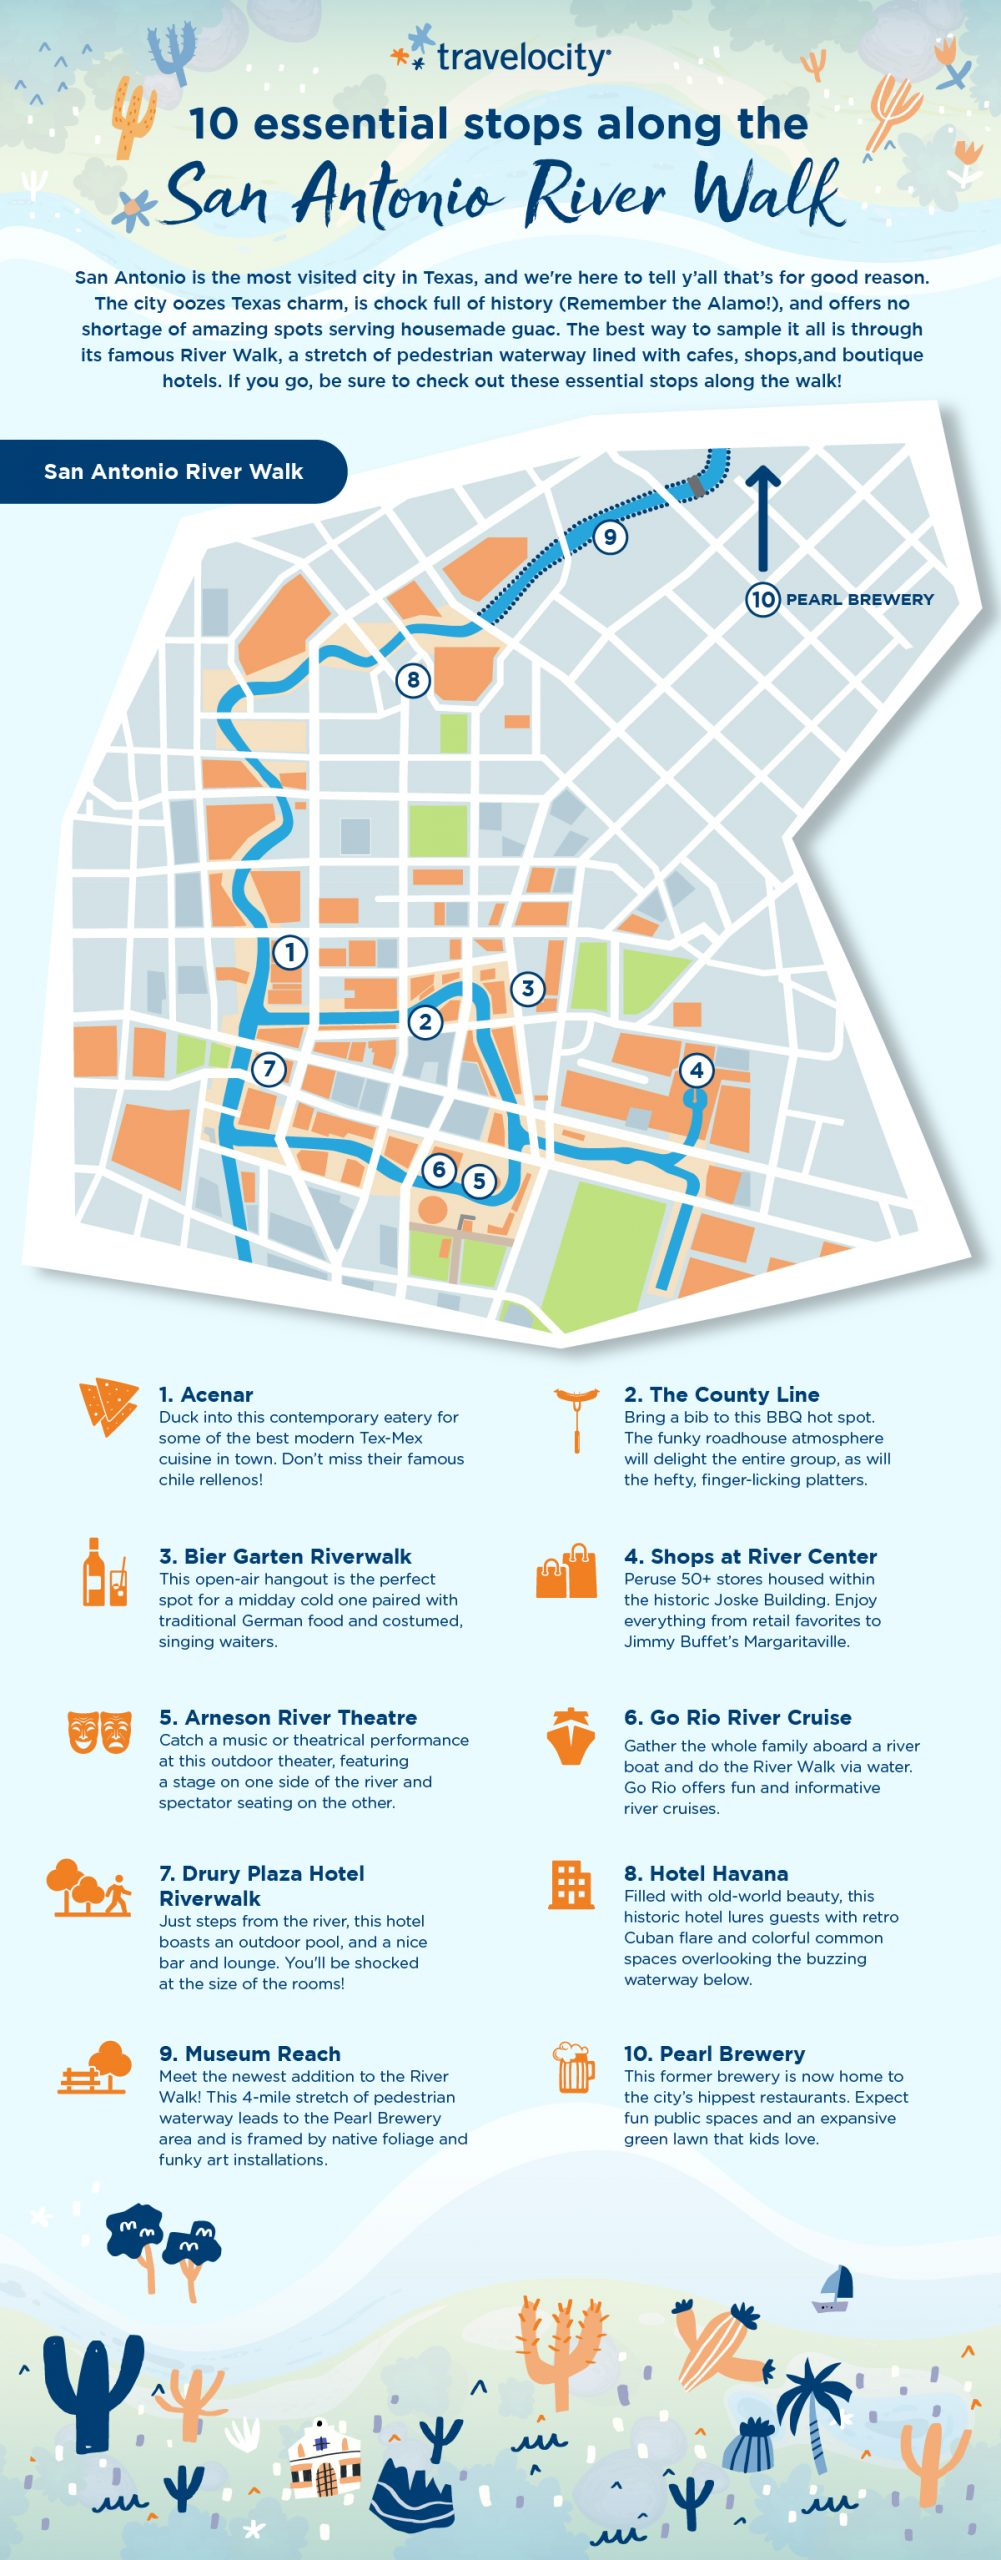 San Antonio Riverwalk map with attractions